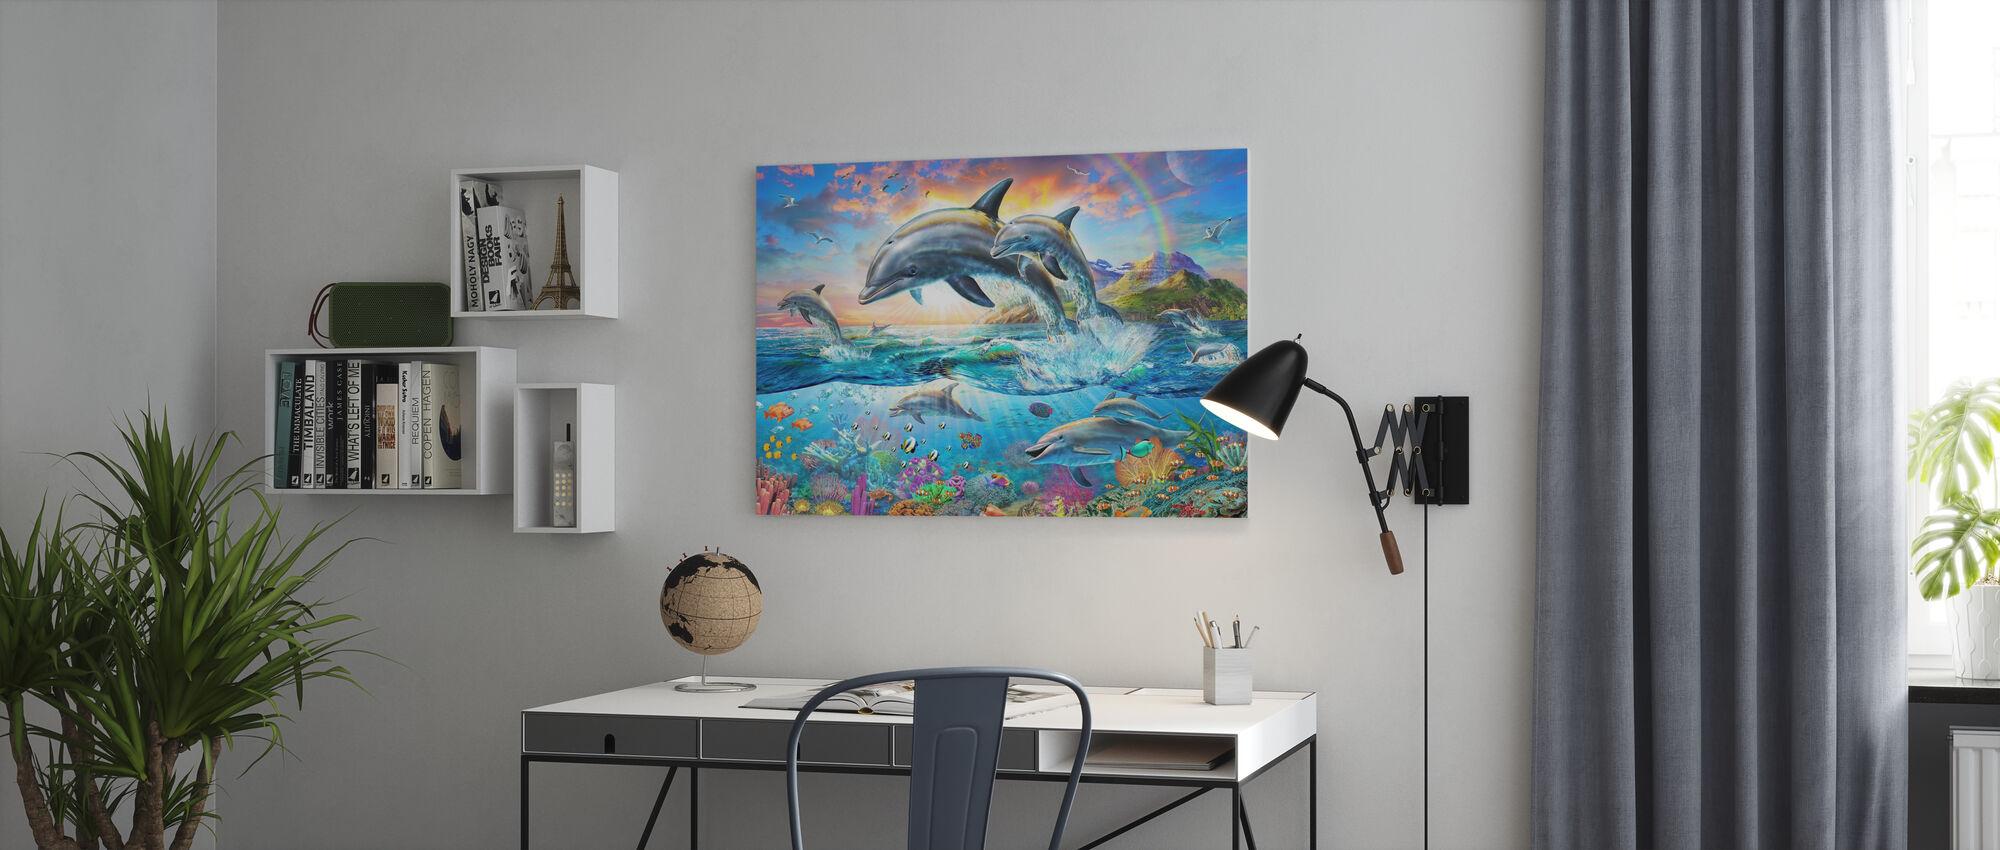 Dolphin Family - Canvas print - Office